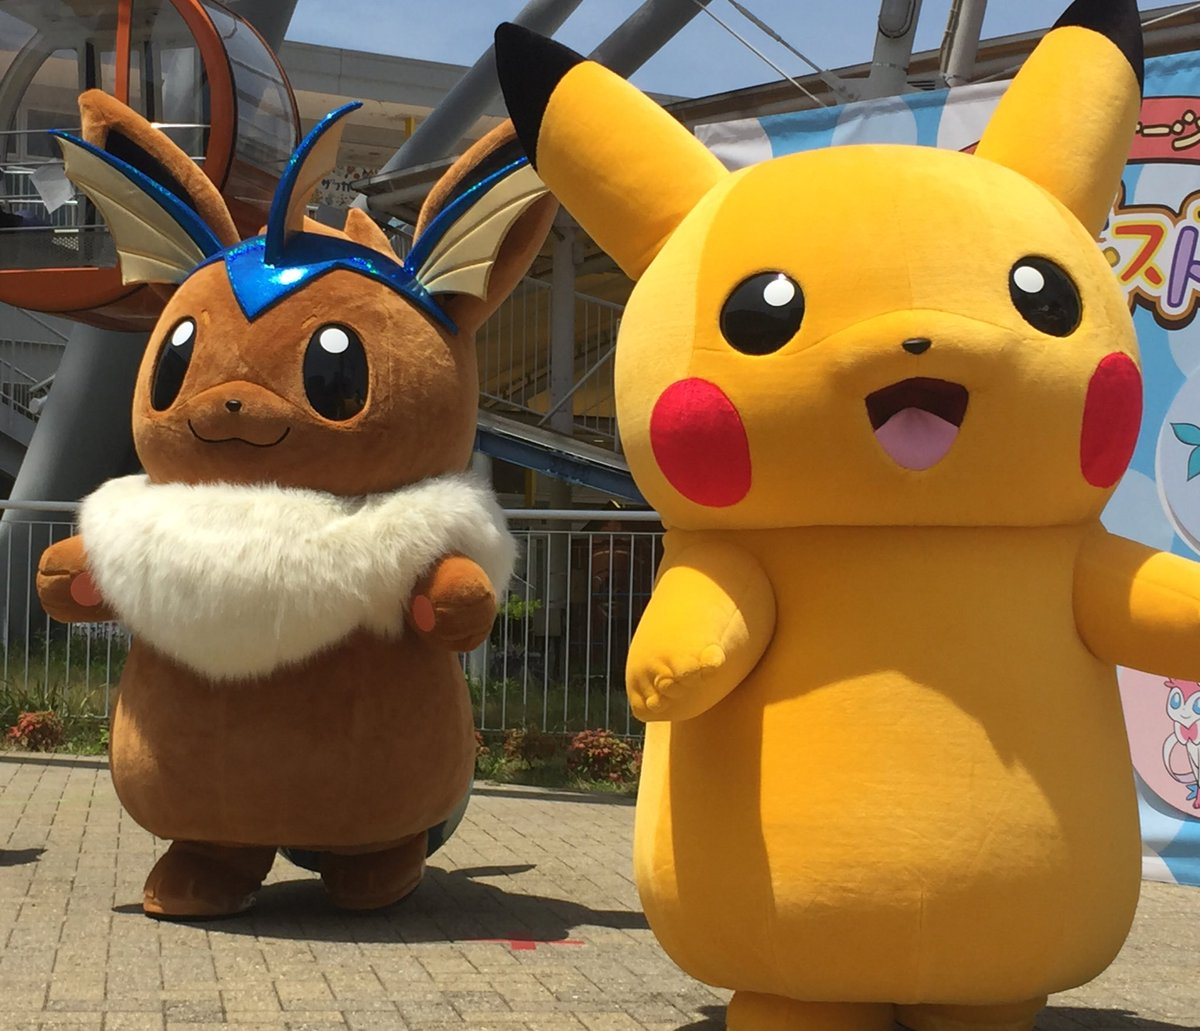 eevee cosplays as its evolutions in japan nintendosoup